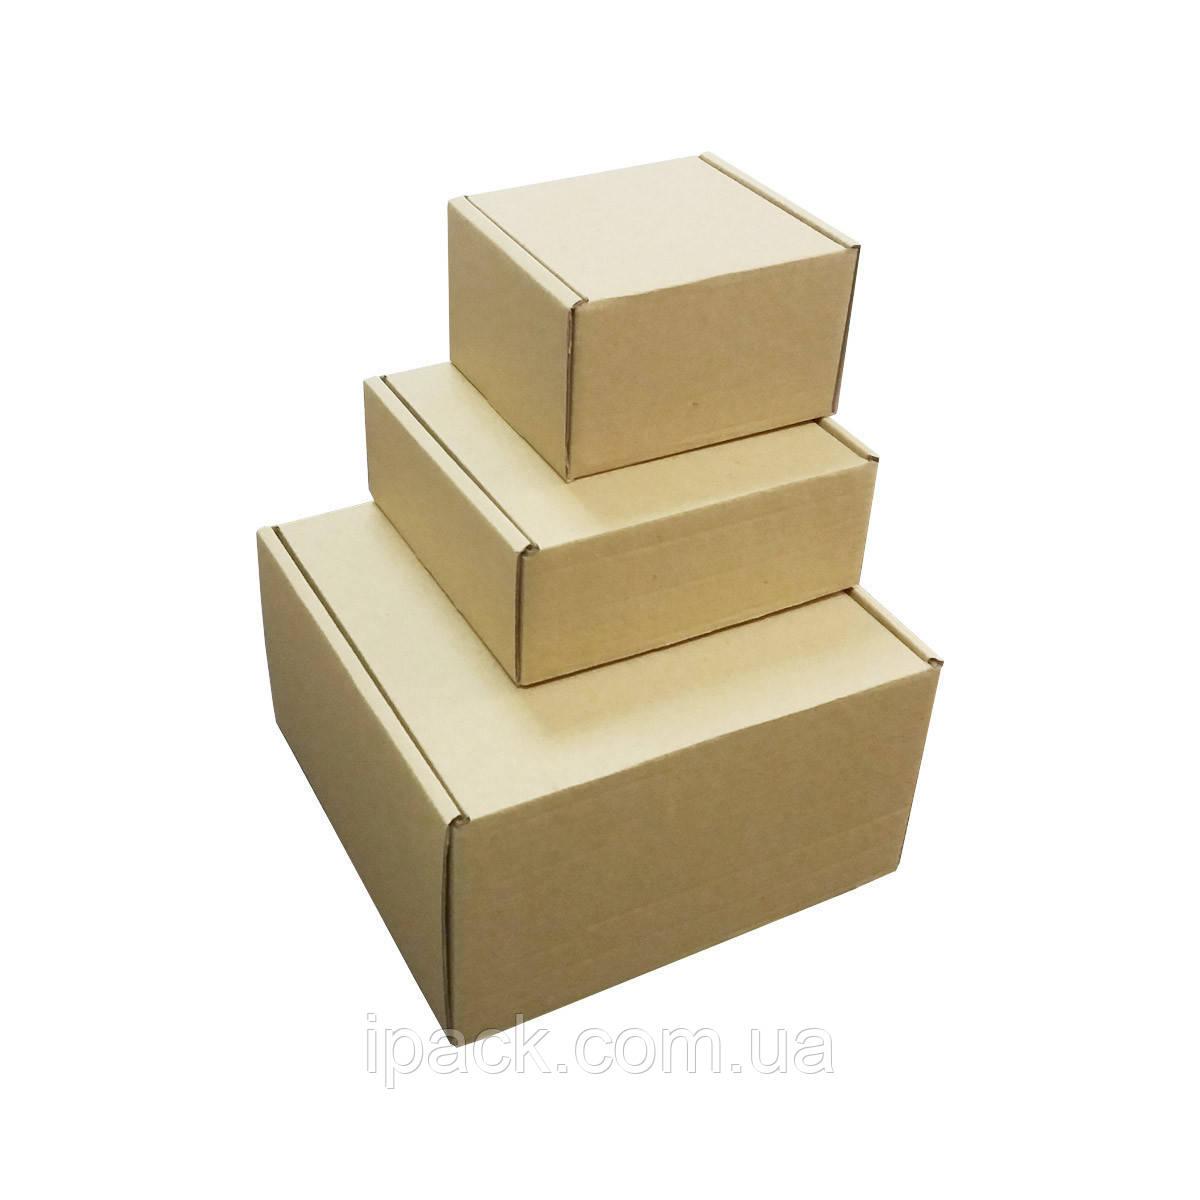 Коробка картонная самосборная, 200*150*100, мм, бурая, крафт, микрогофрокартон